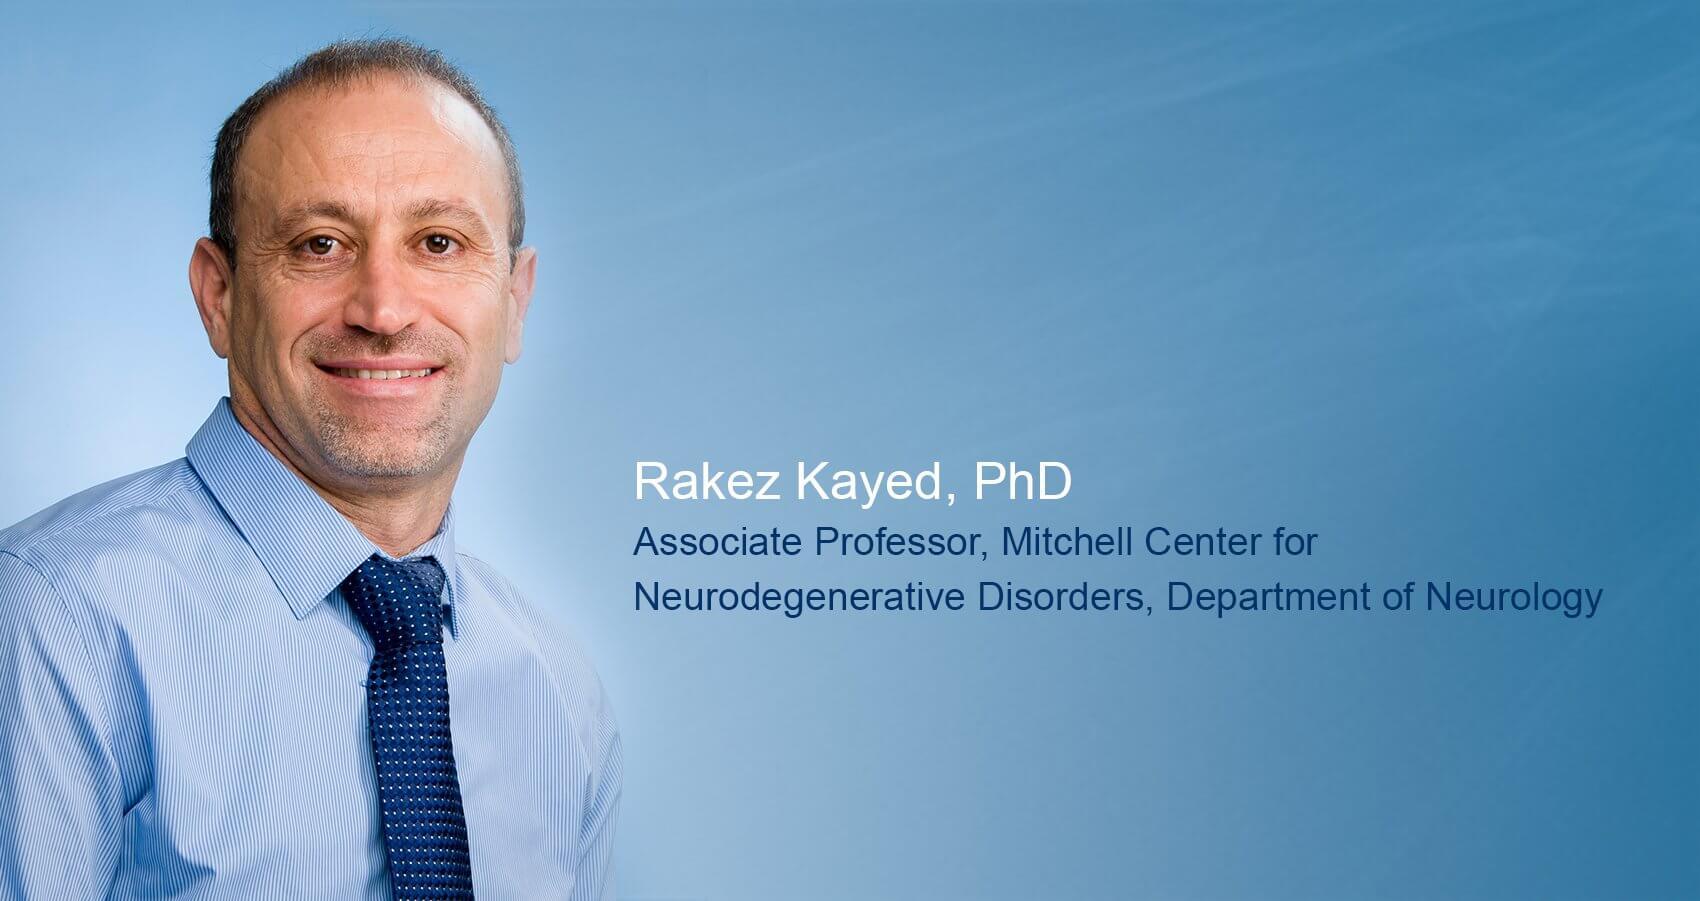 Rakez Kayed, PhD